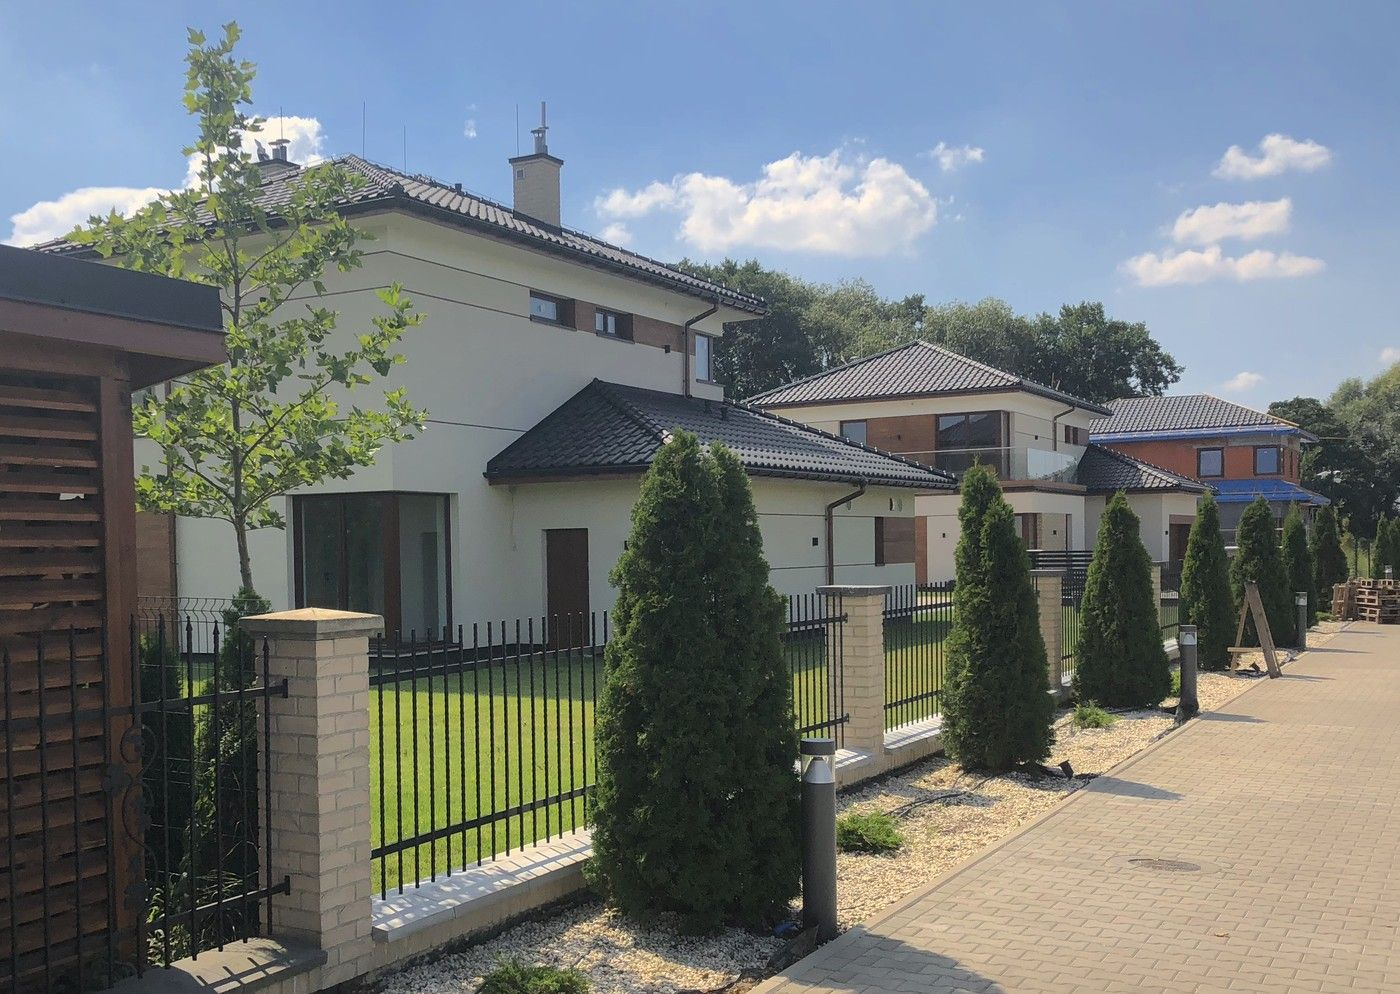 WILANOWKA-2